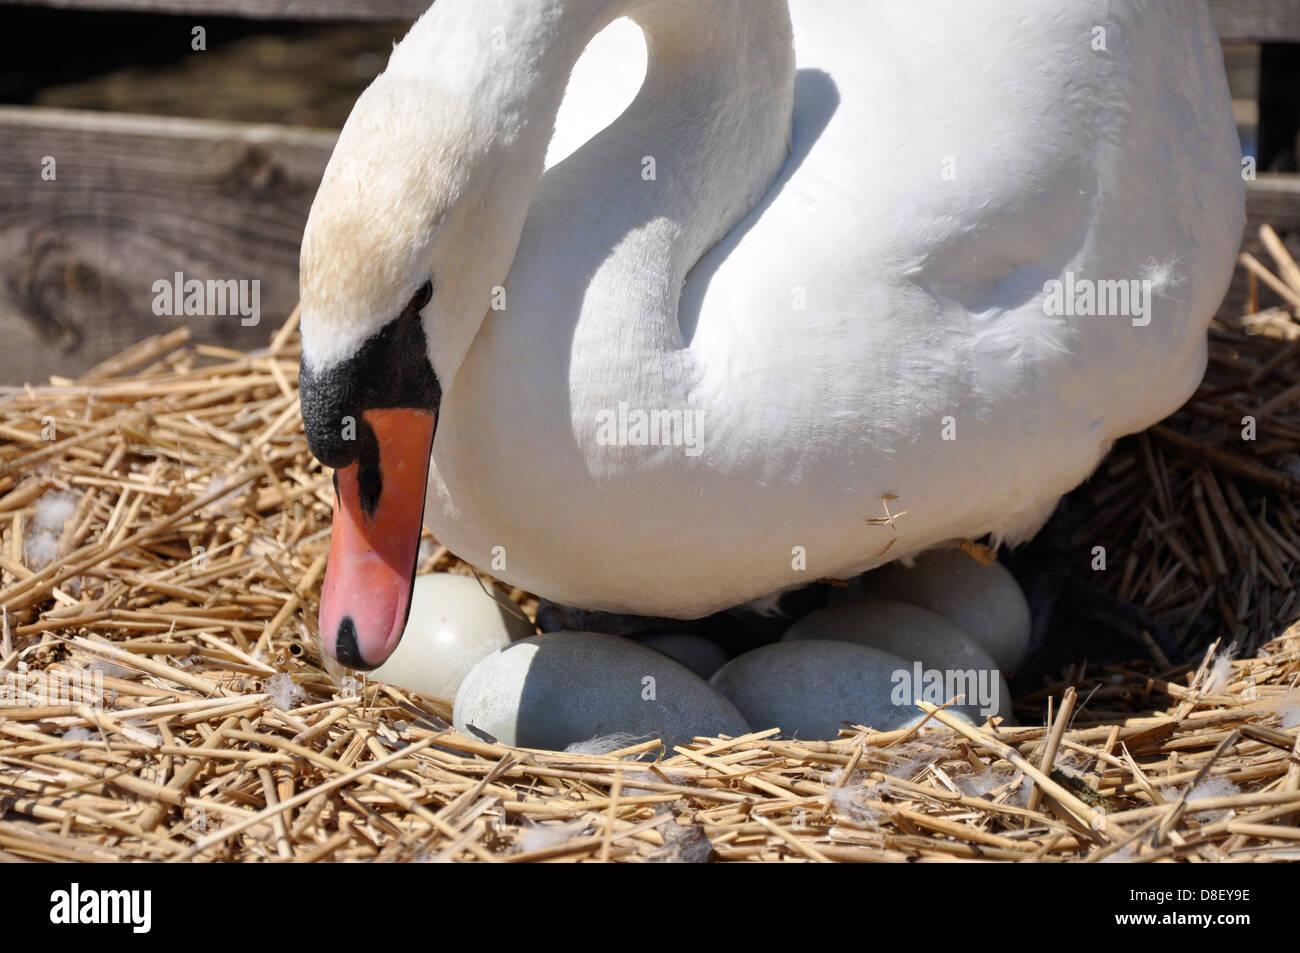 Mute swan (Cygnus olor) on eggs, Abbotsbury Swannery, Dorset Stock Photo